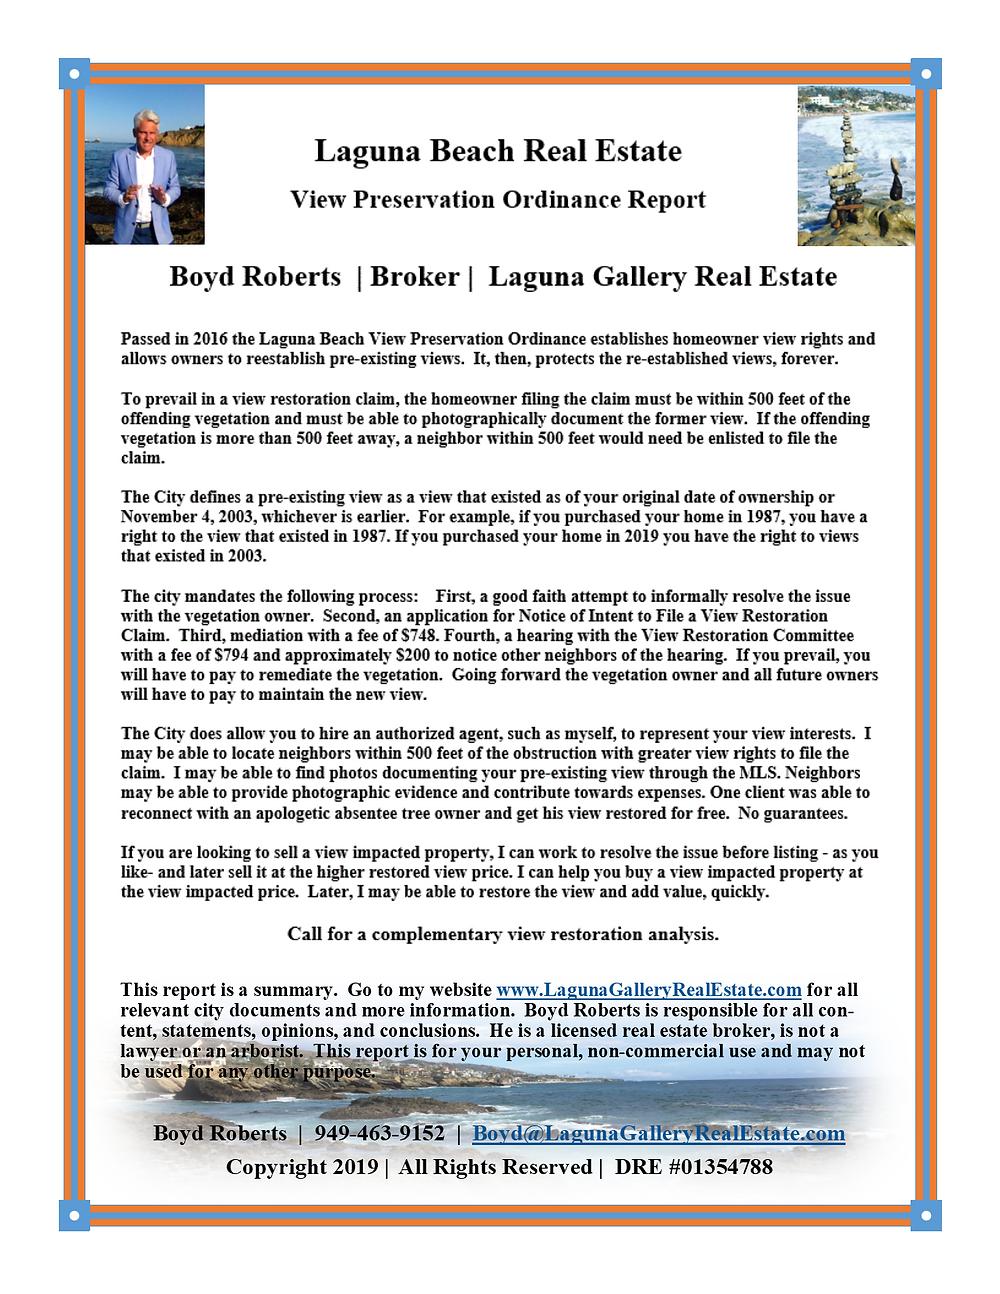 A special Laguna Beach real estate report on the Laguna Beach View Preservation Ordinance